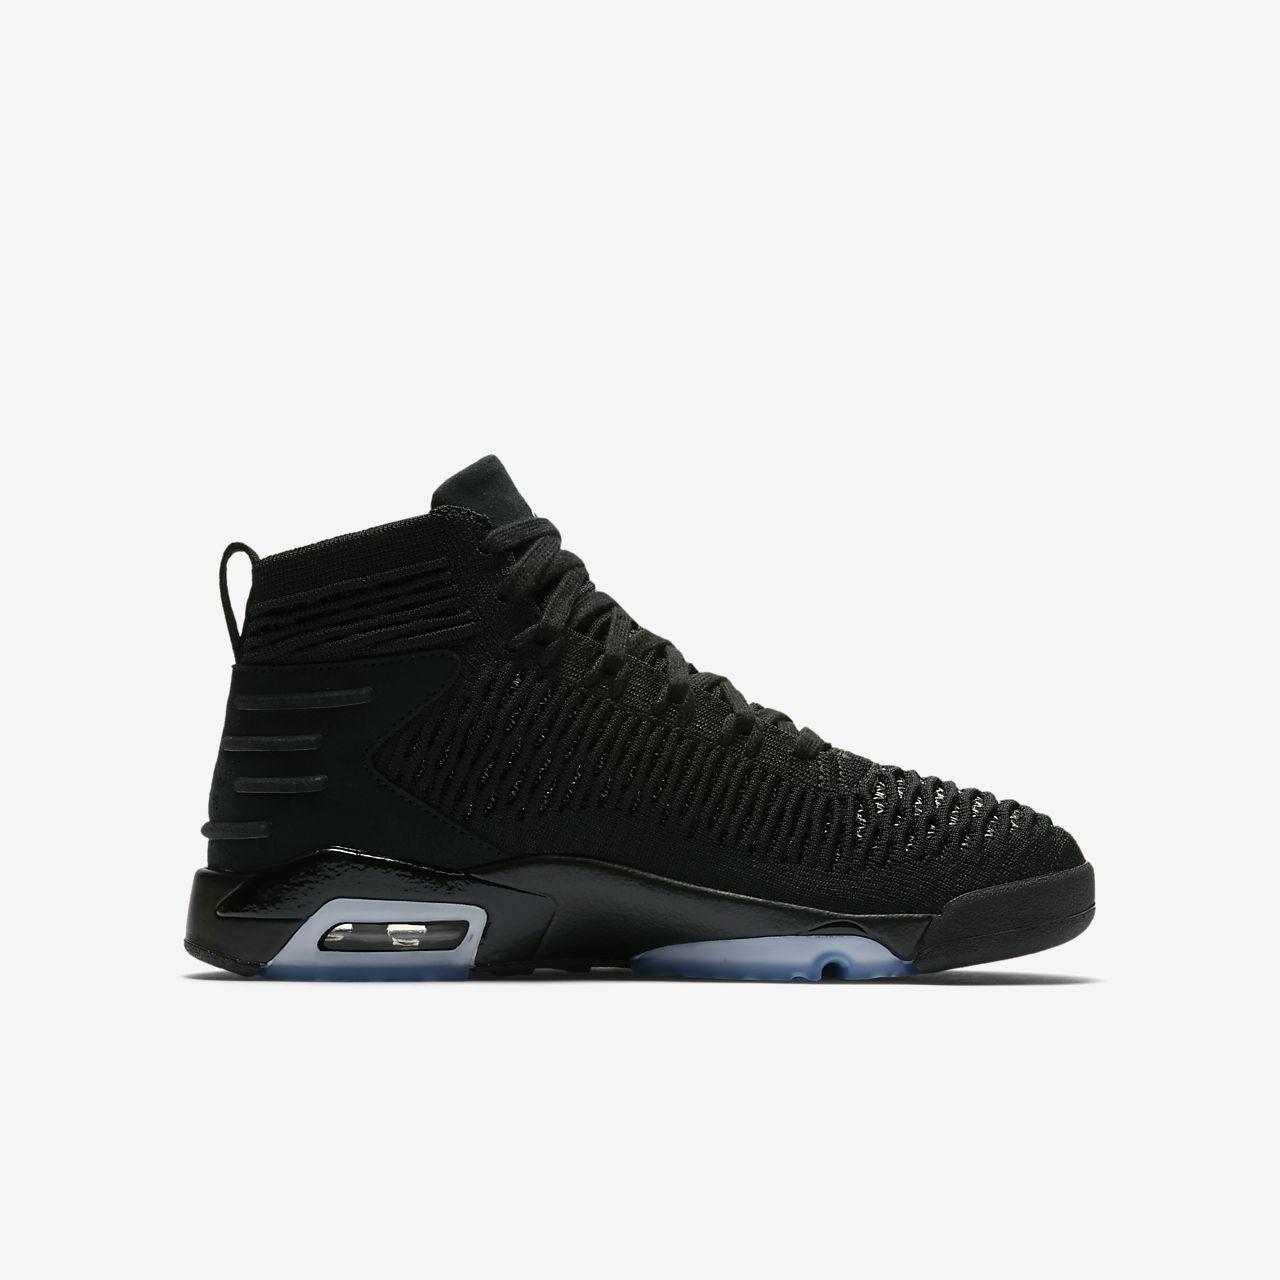 23 jordan shoe black and red nz